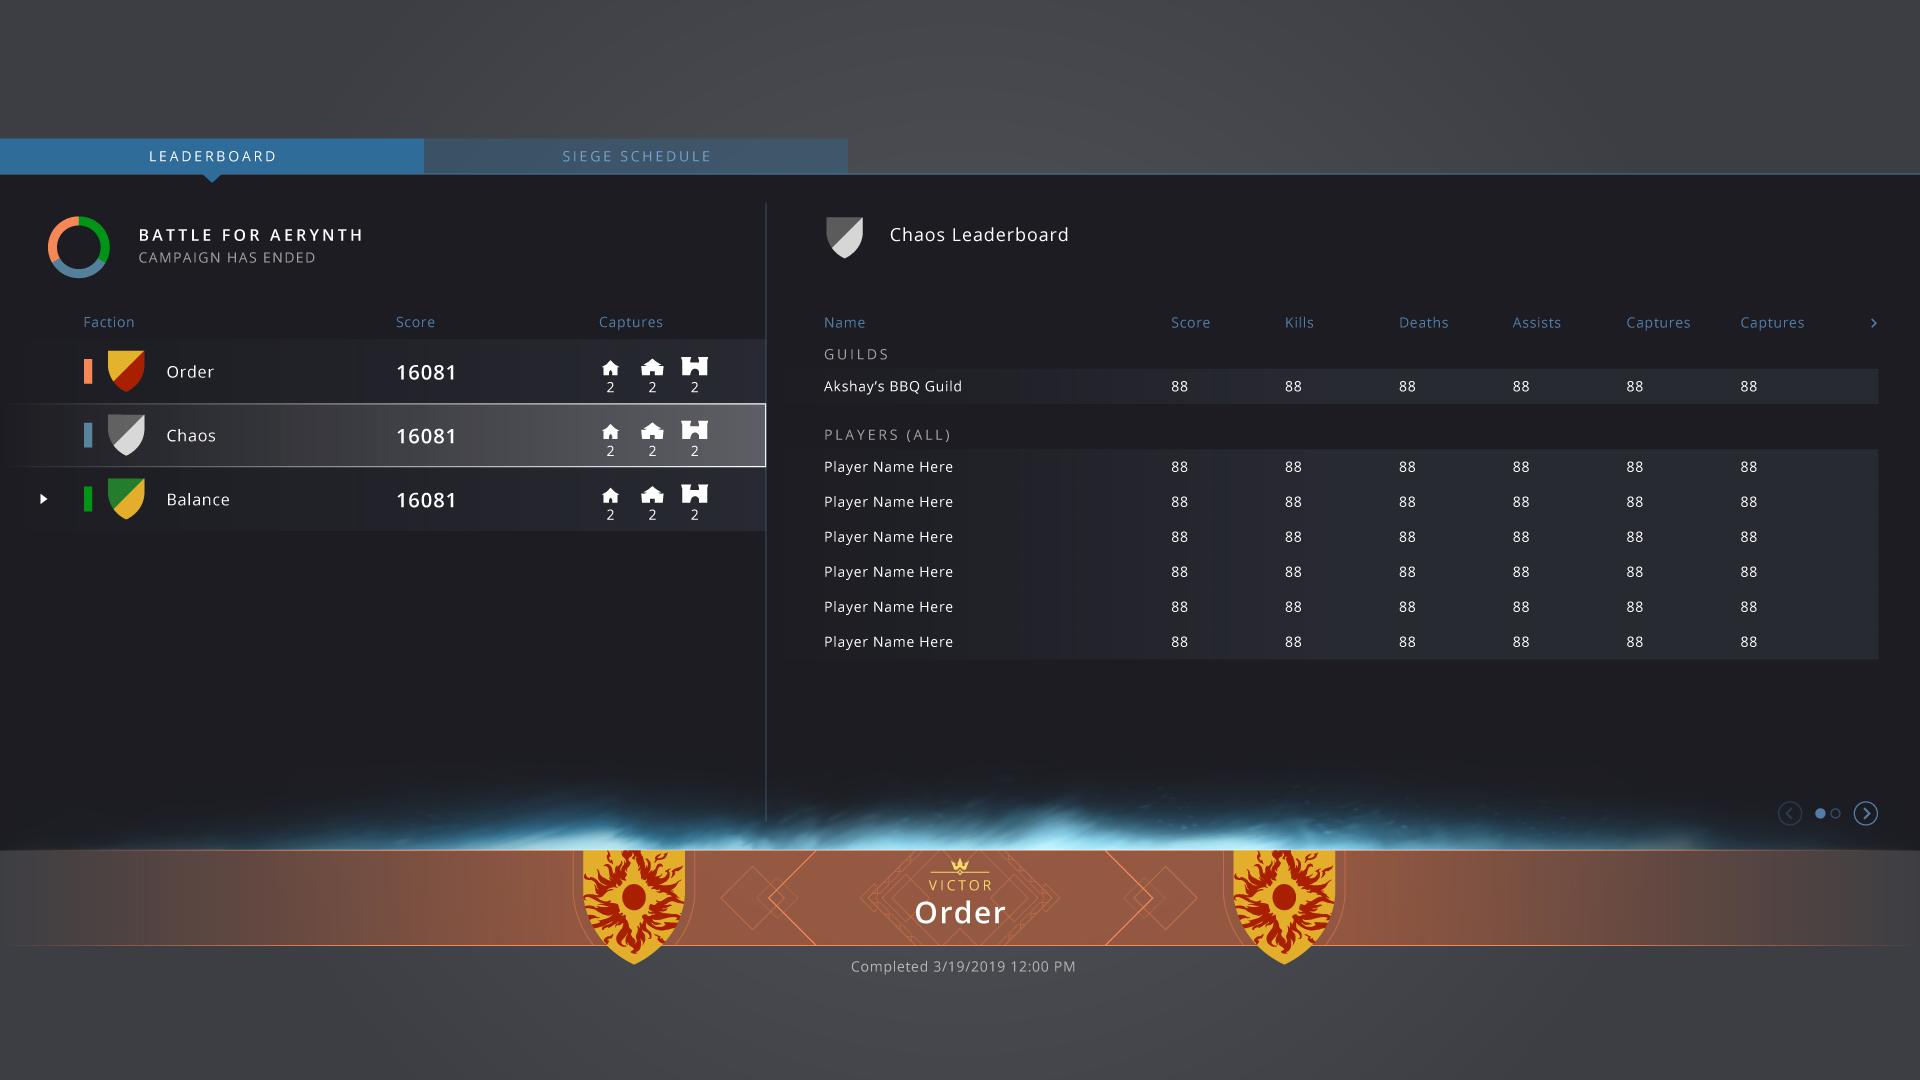 Full screen leaderboard